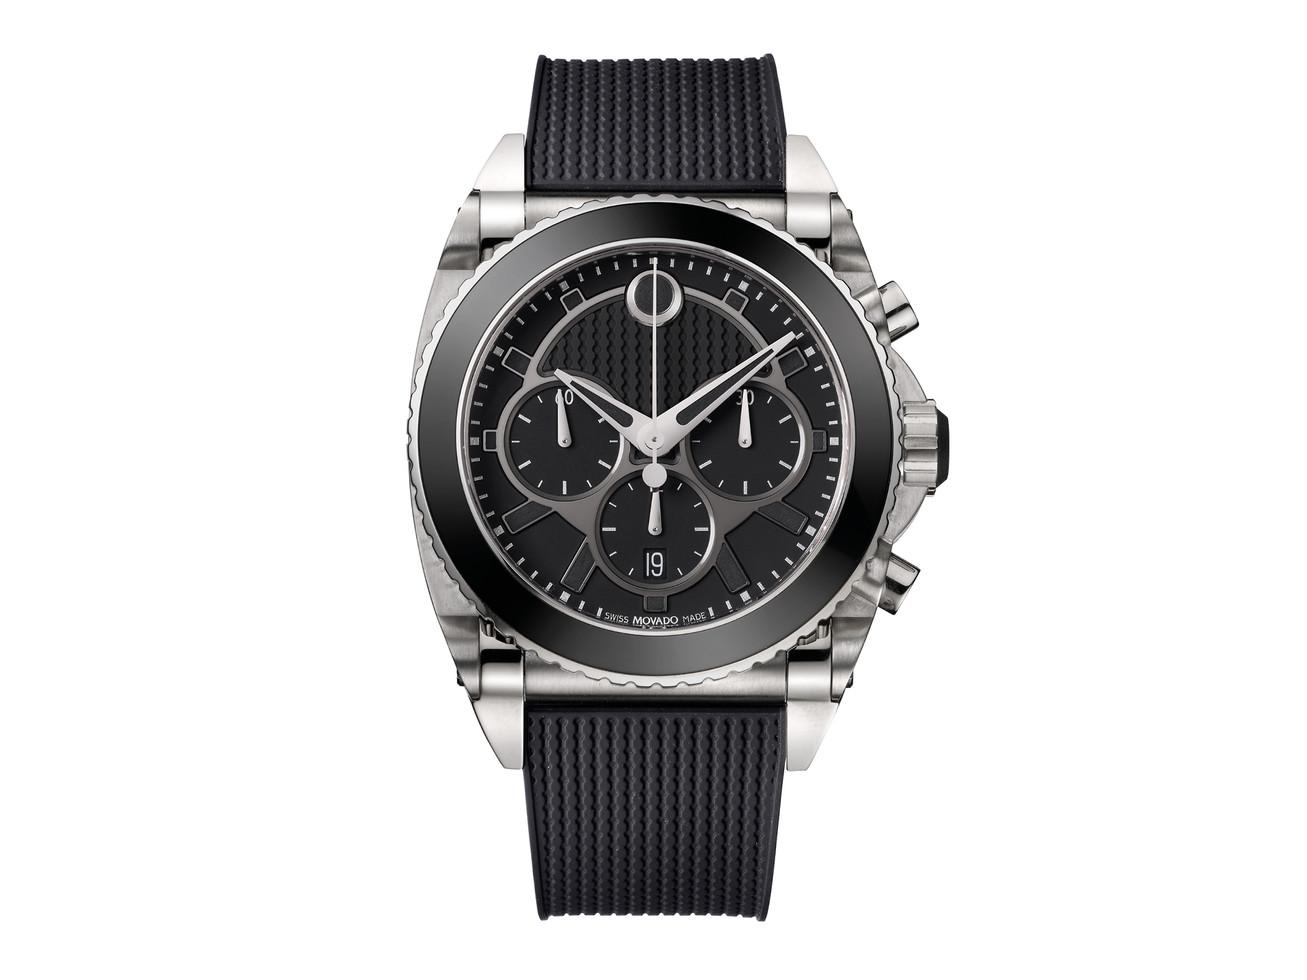 Movado Master - Chronograph